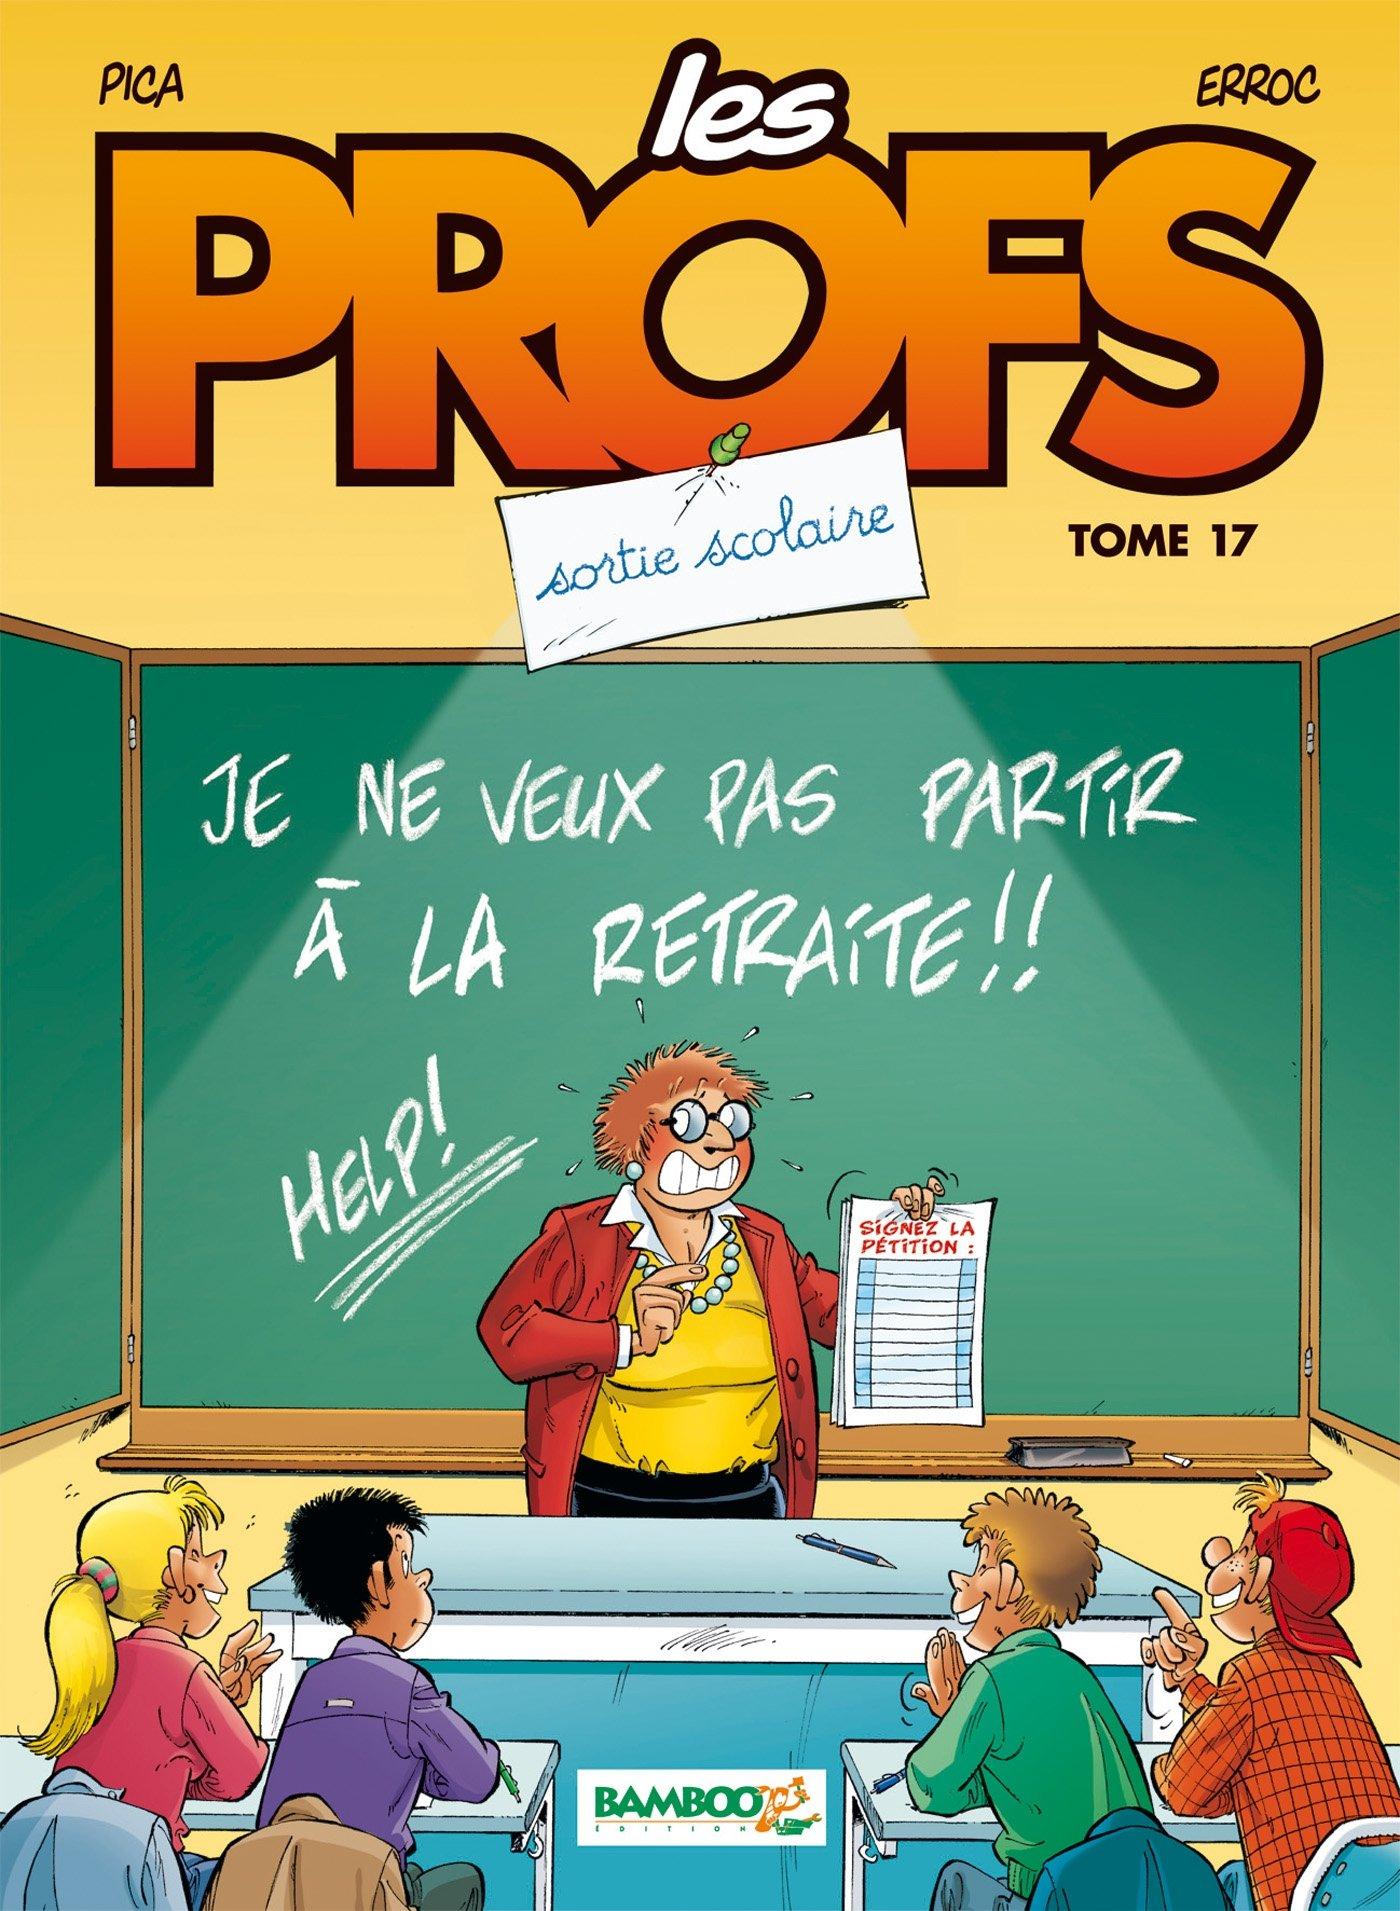 Les Profs - Tome 17 - Sortie Scolaire - Erroc - Pica - couverture